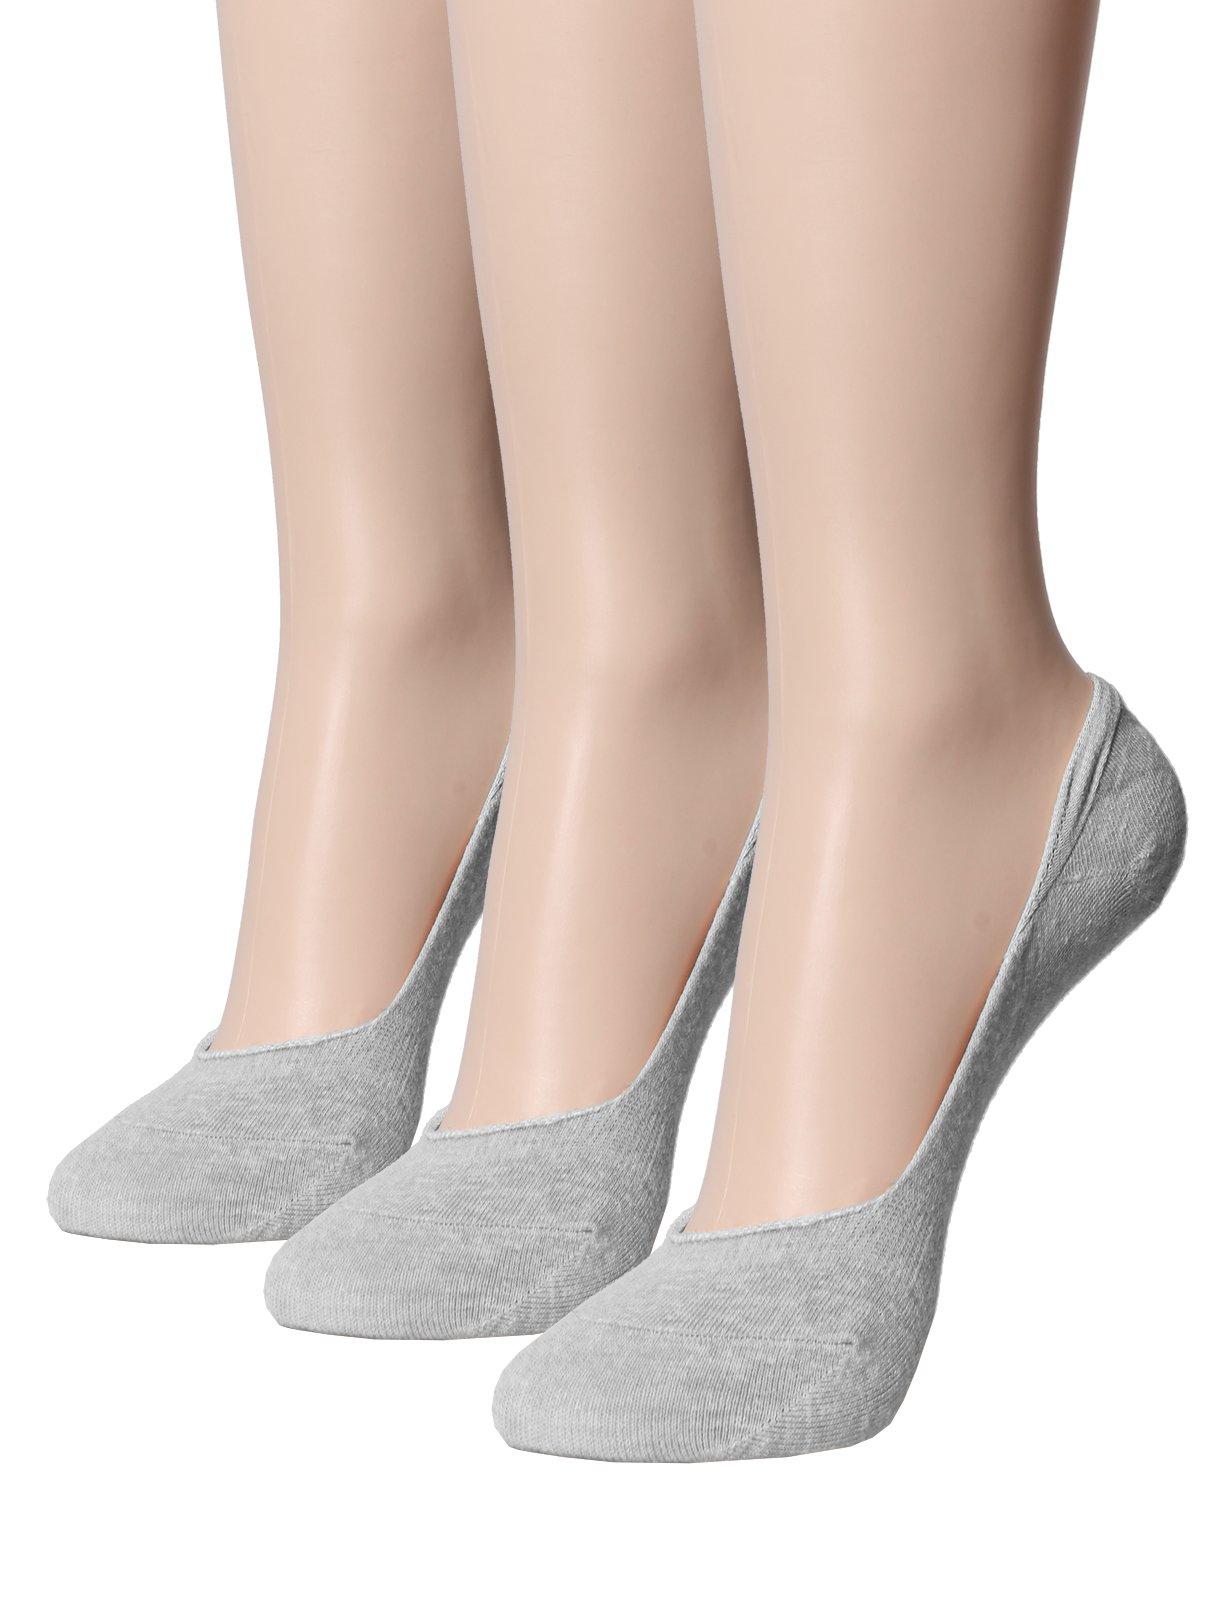 OSABASA Women's 3 Pack Casual Invisible No Show Socks Non Slip(SET3KWMS0241-GRAY) by OSABASA